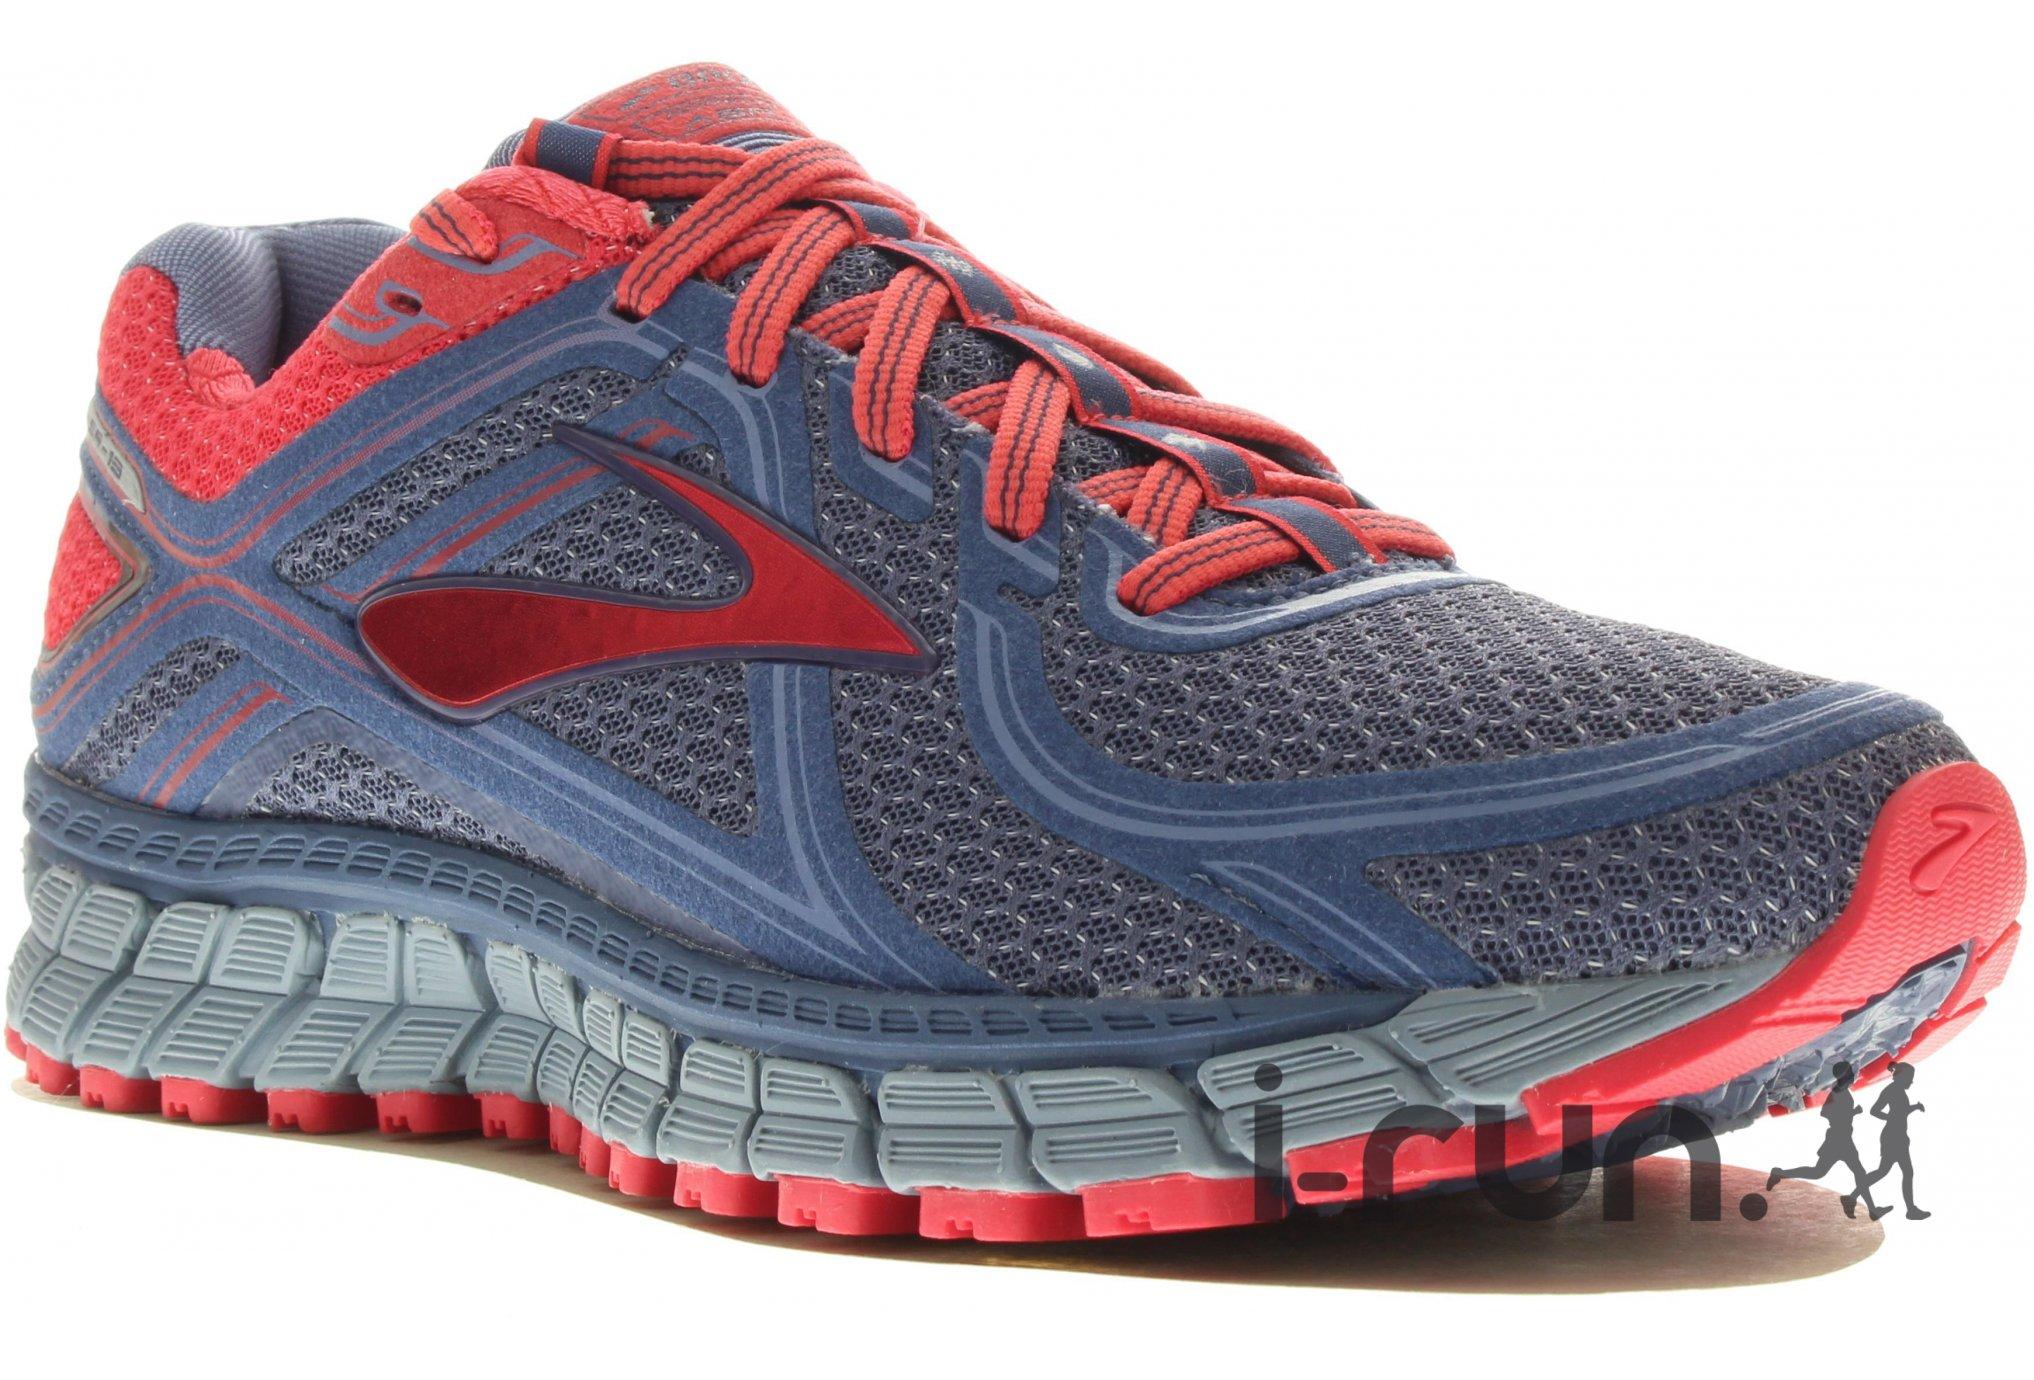 Brooks Adrenaline asr 13 w chaussures running femme